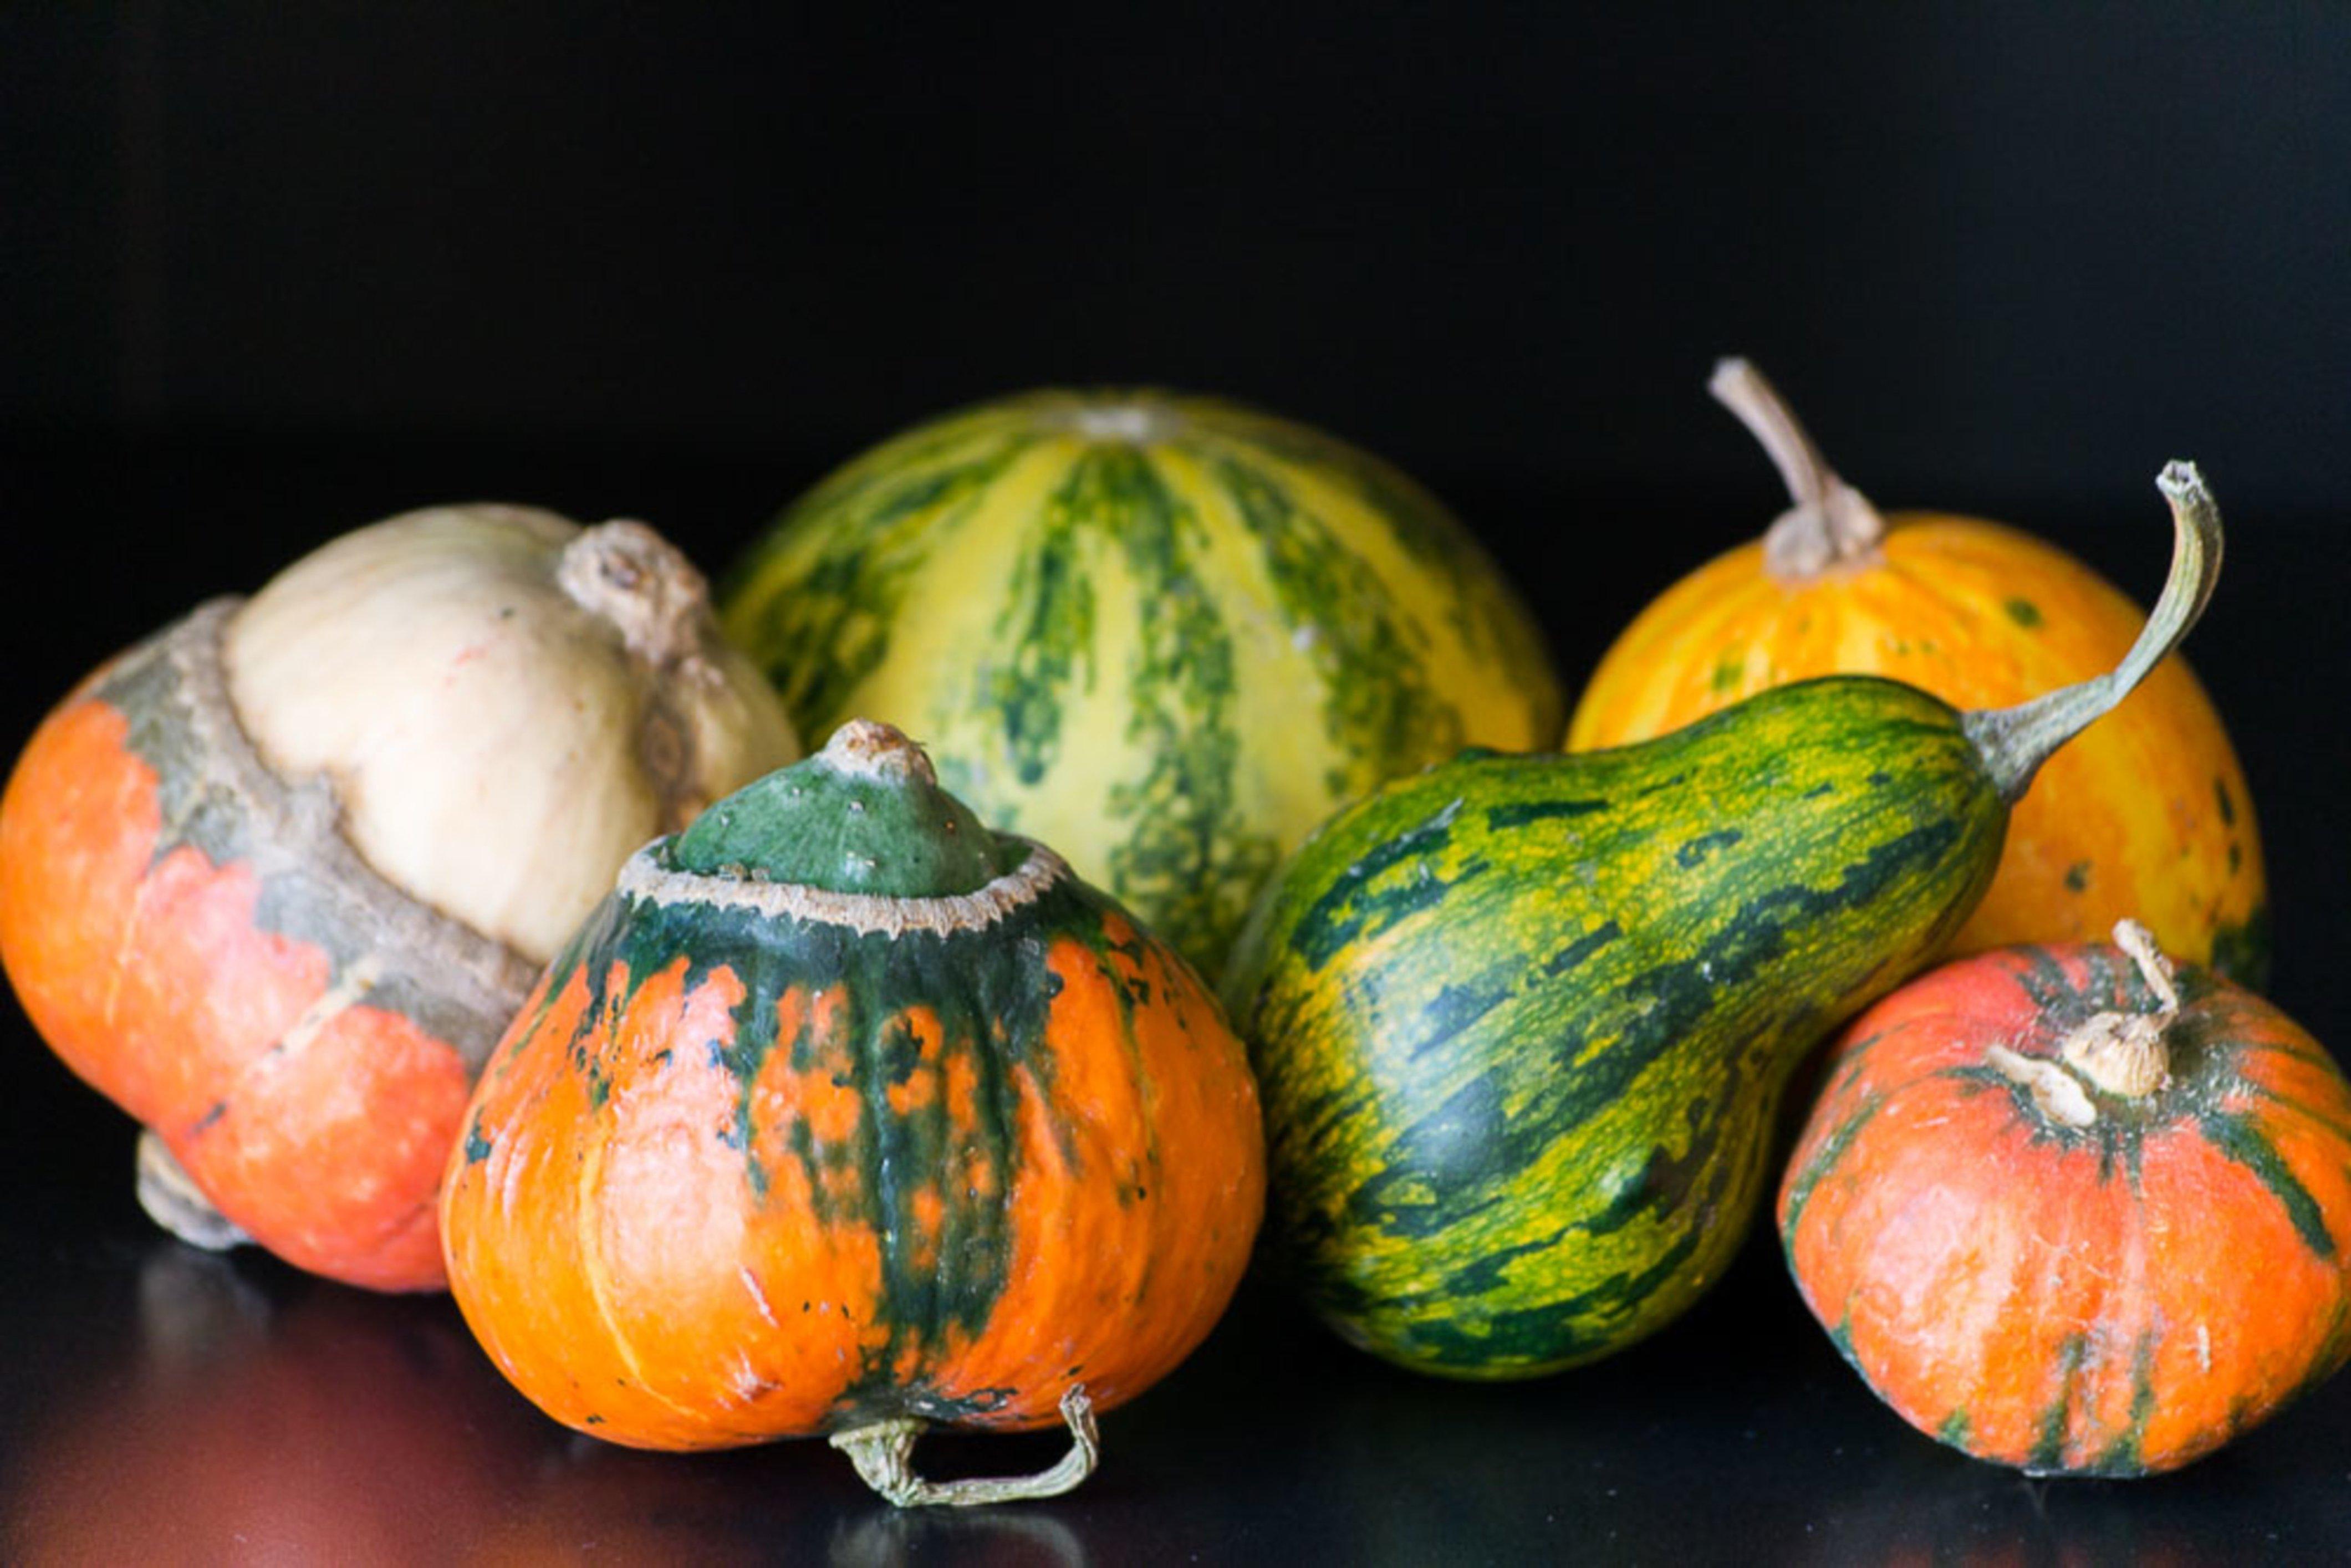 Use veggies to make vases